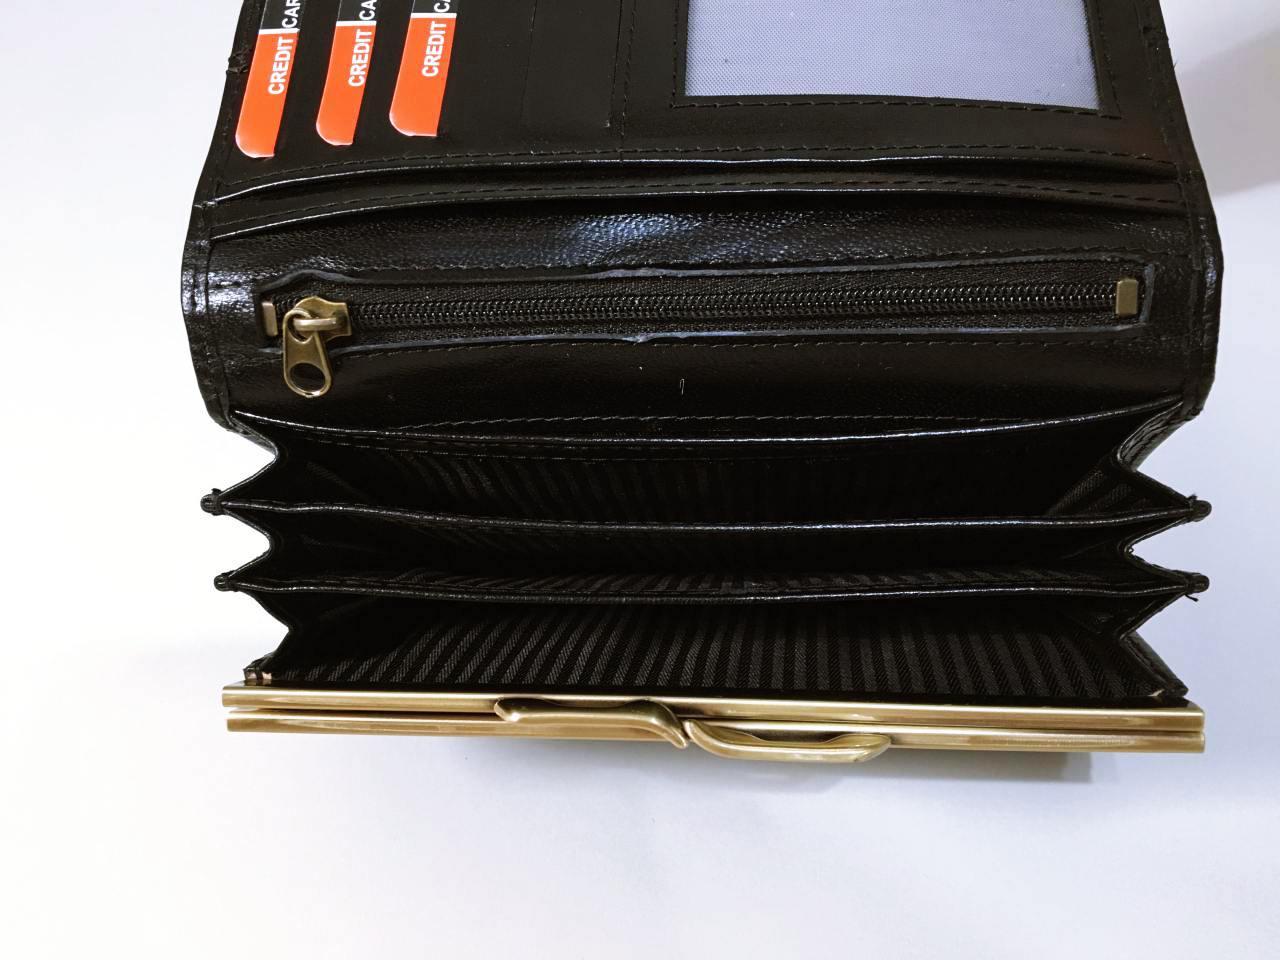 Kožená peněženka Lorenti N černá 04